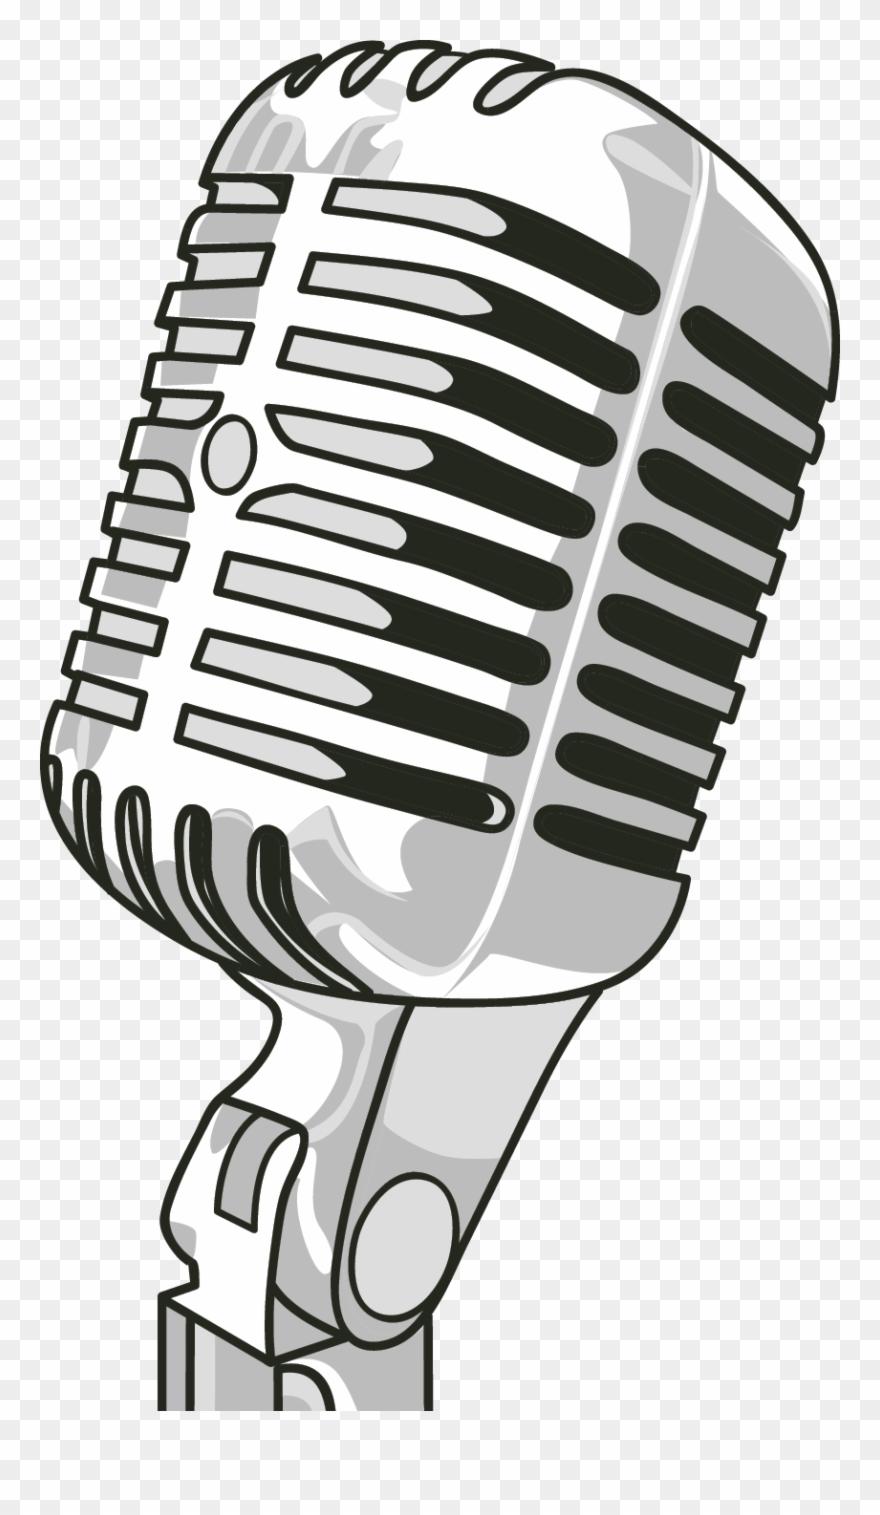 Microphone clip art poster. Air clipart radio mic